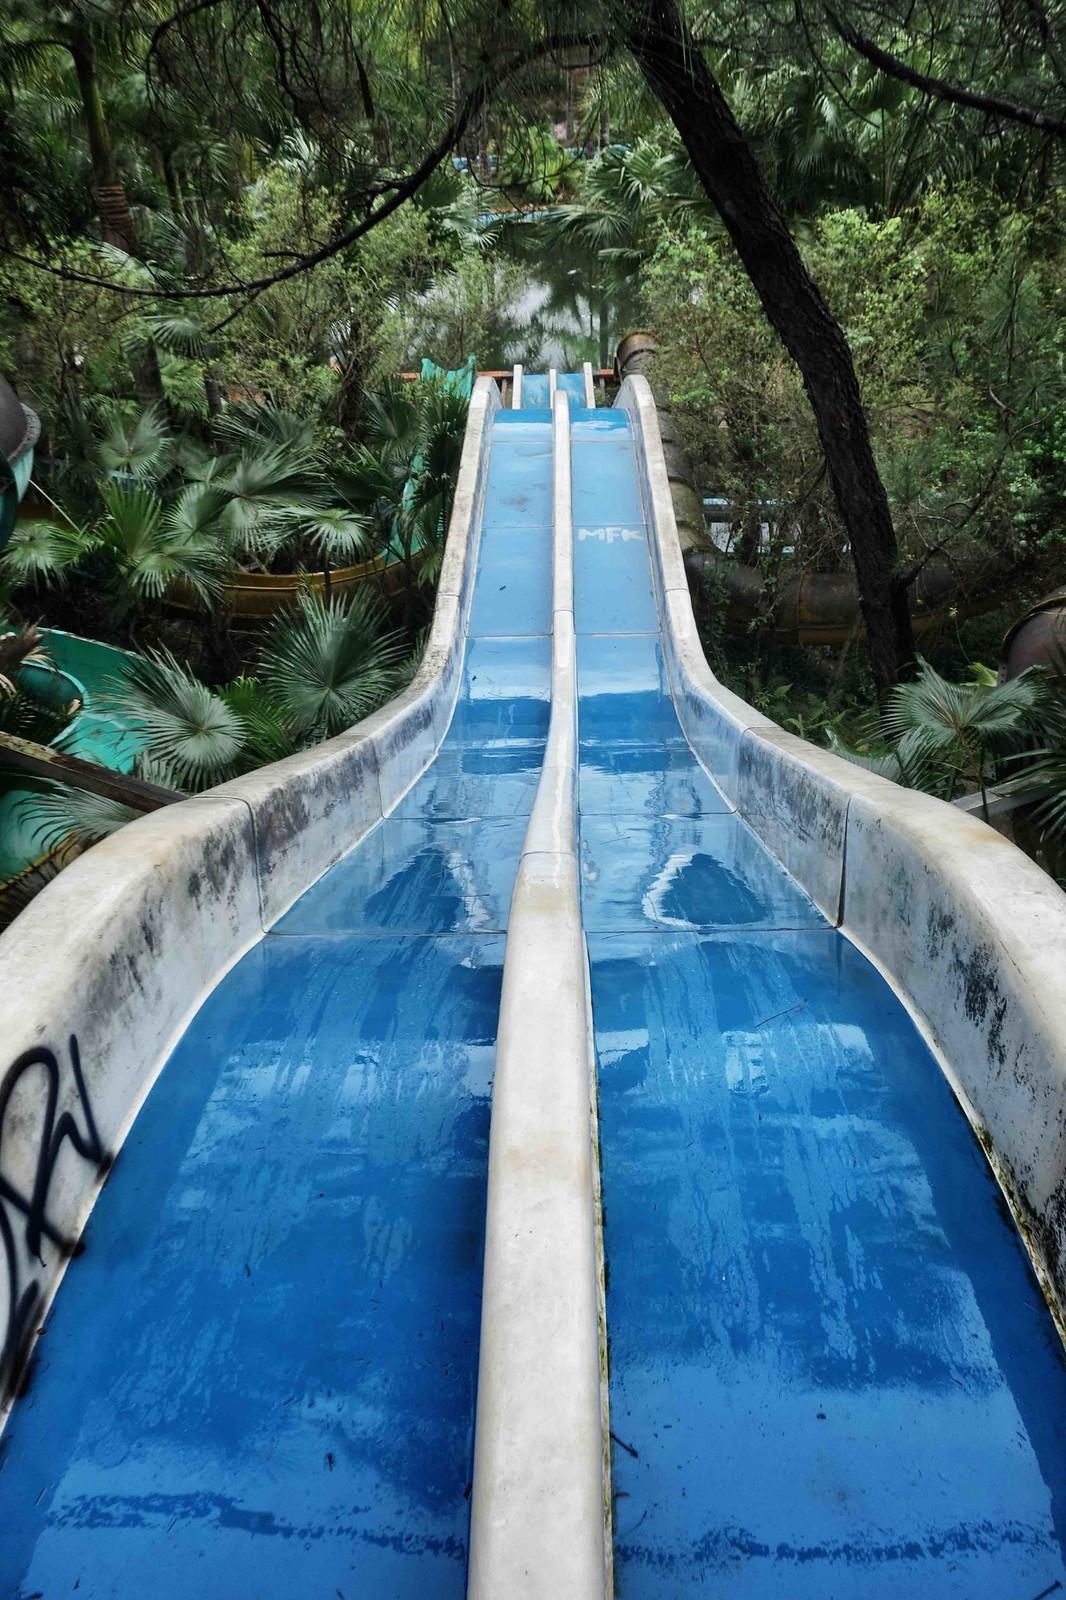 Hue - Ho Thuy Tien - Abandoned Water Park - Slides 2